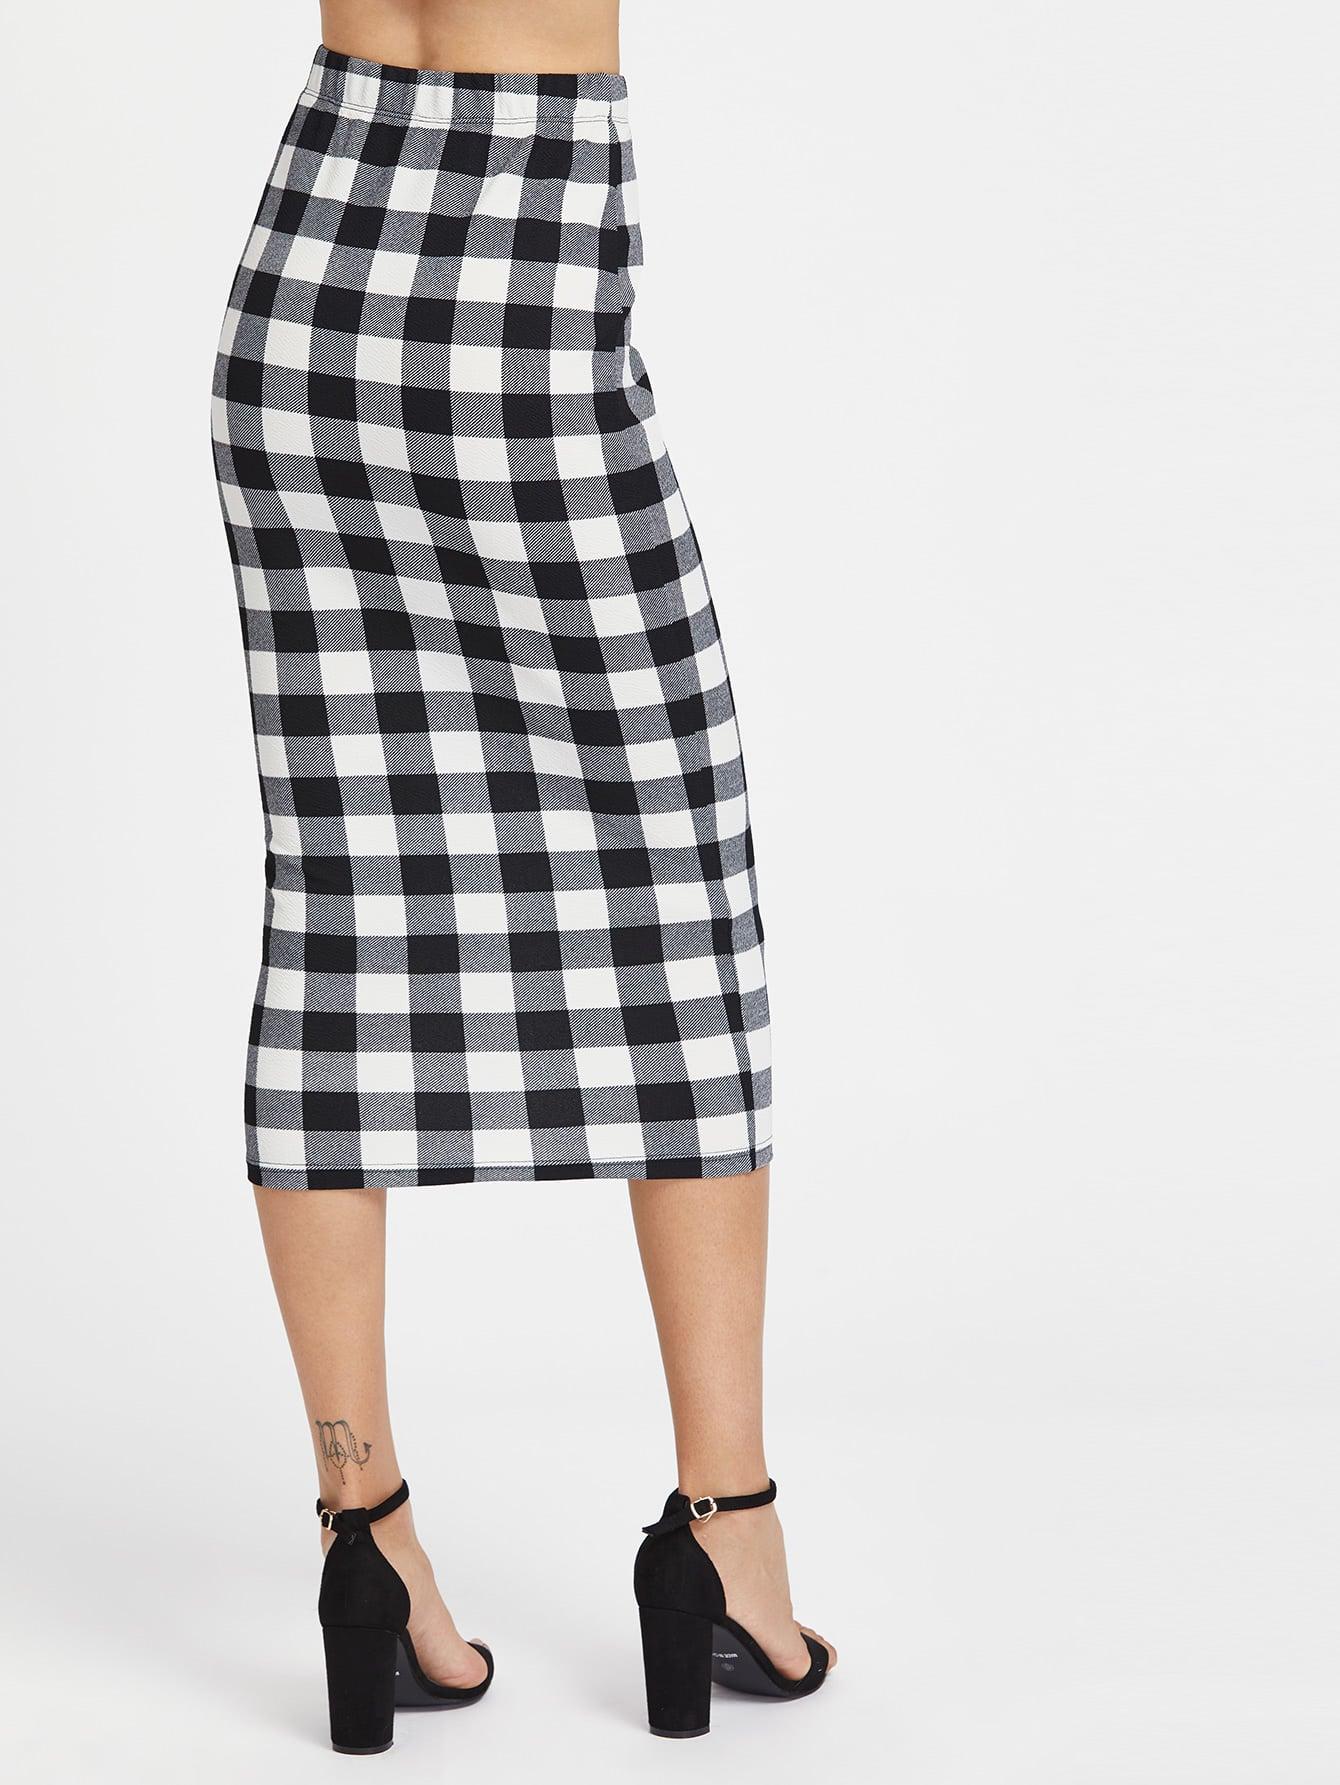 ee208b0565 Cheap Elasticized Waist Checkered Midi Pencil Skirt for sale ...